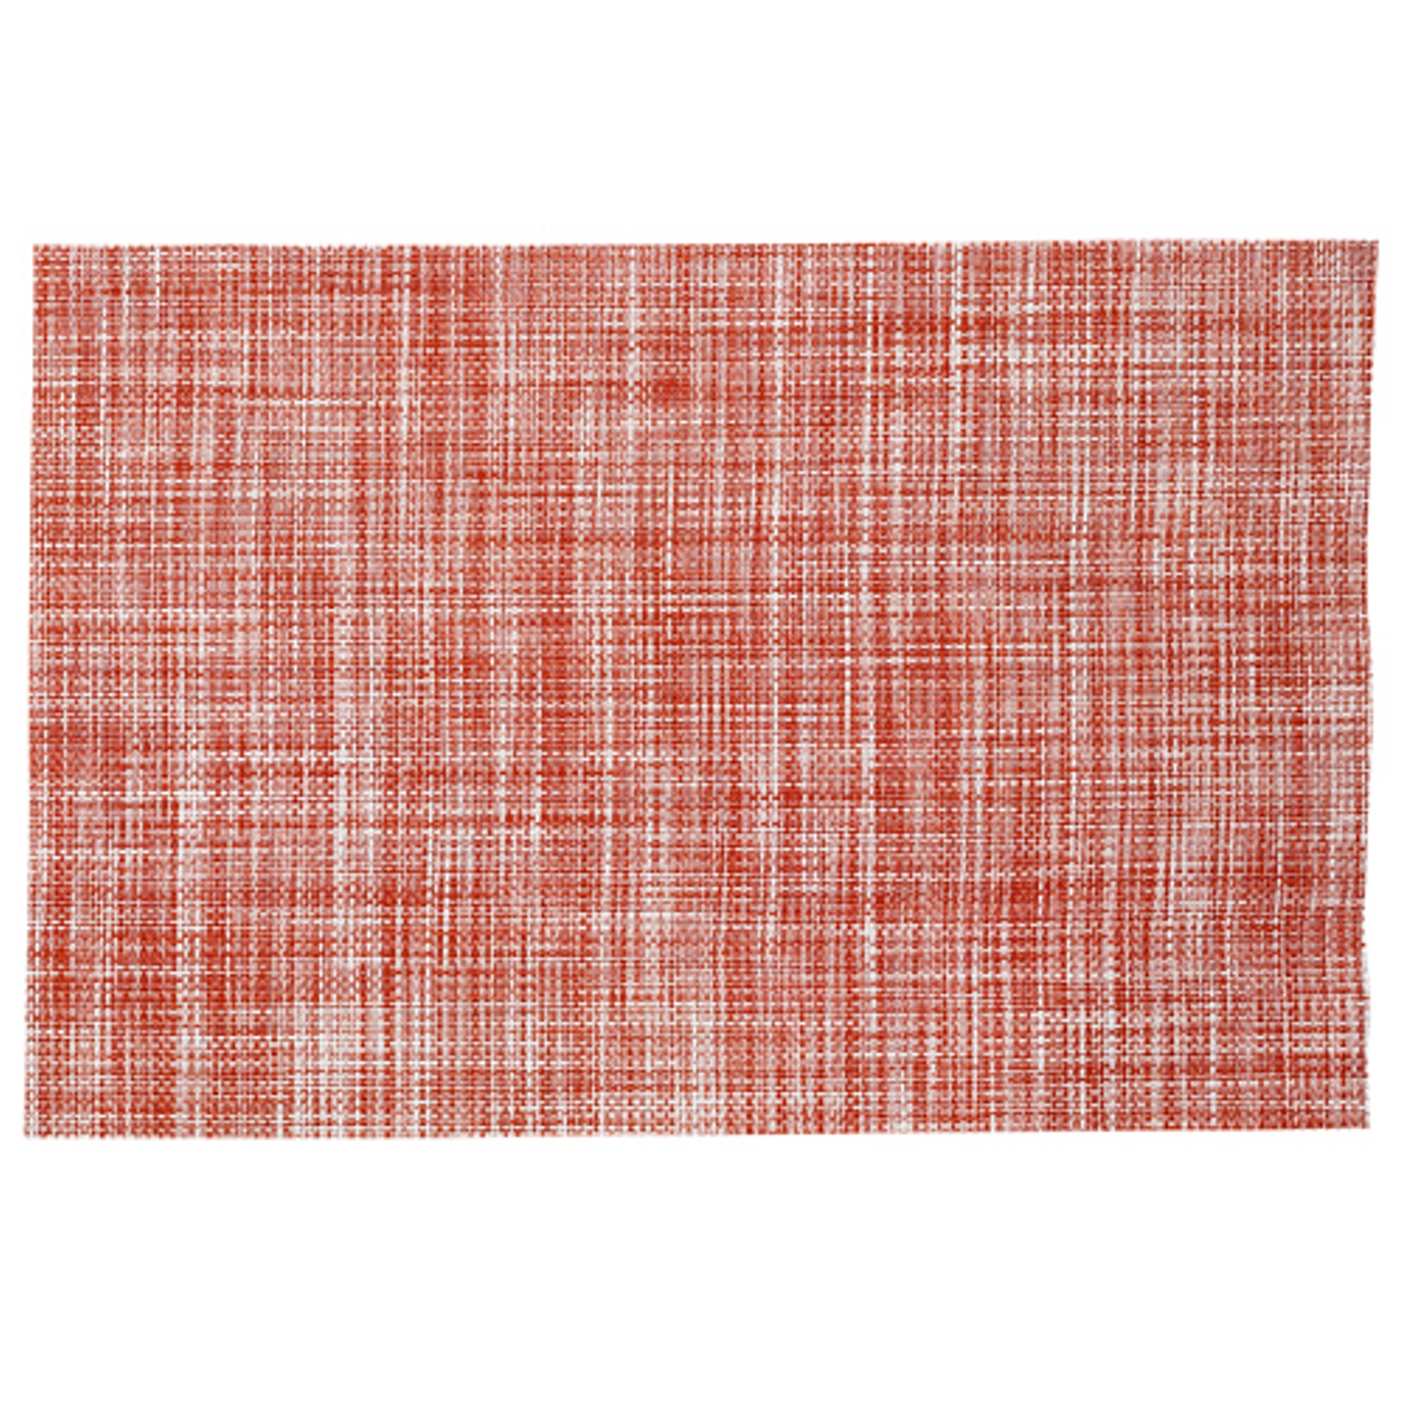 Онлайн каталог PROMENU: Подставка под тарелку Winkler TECHNIQUE TABLE, 45х33 см, красный Winkler 3335040000